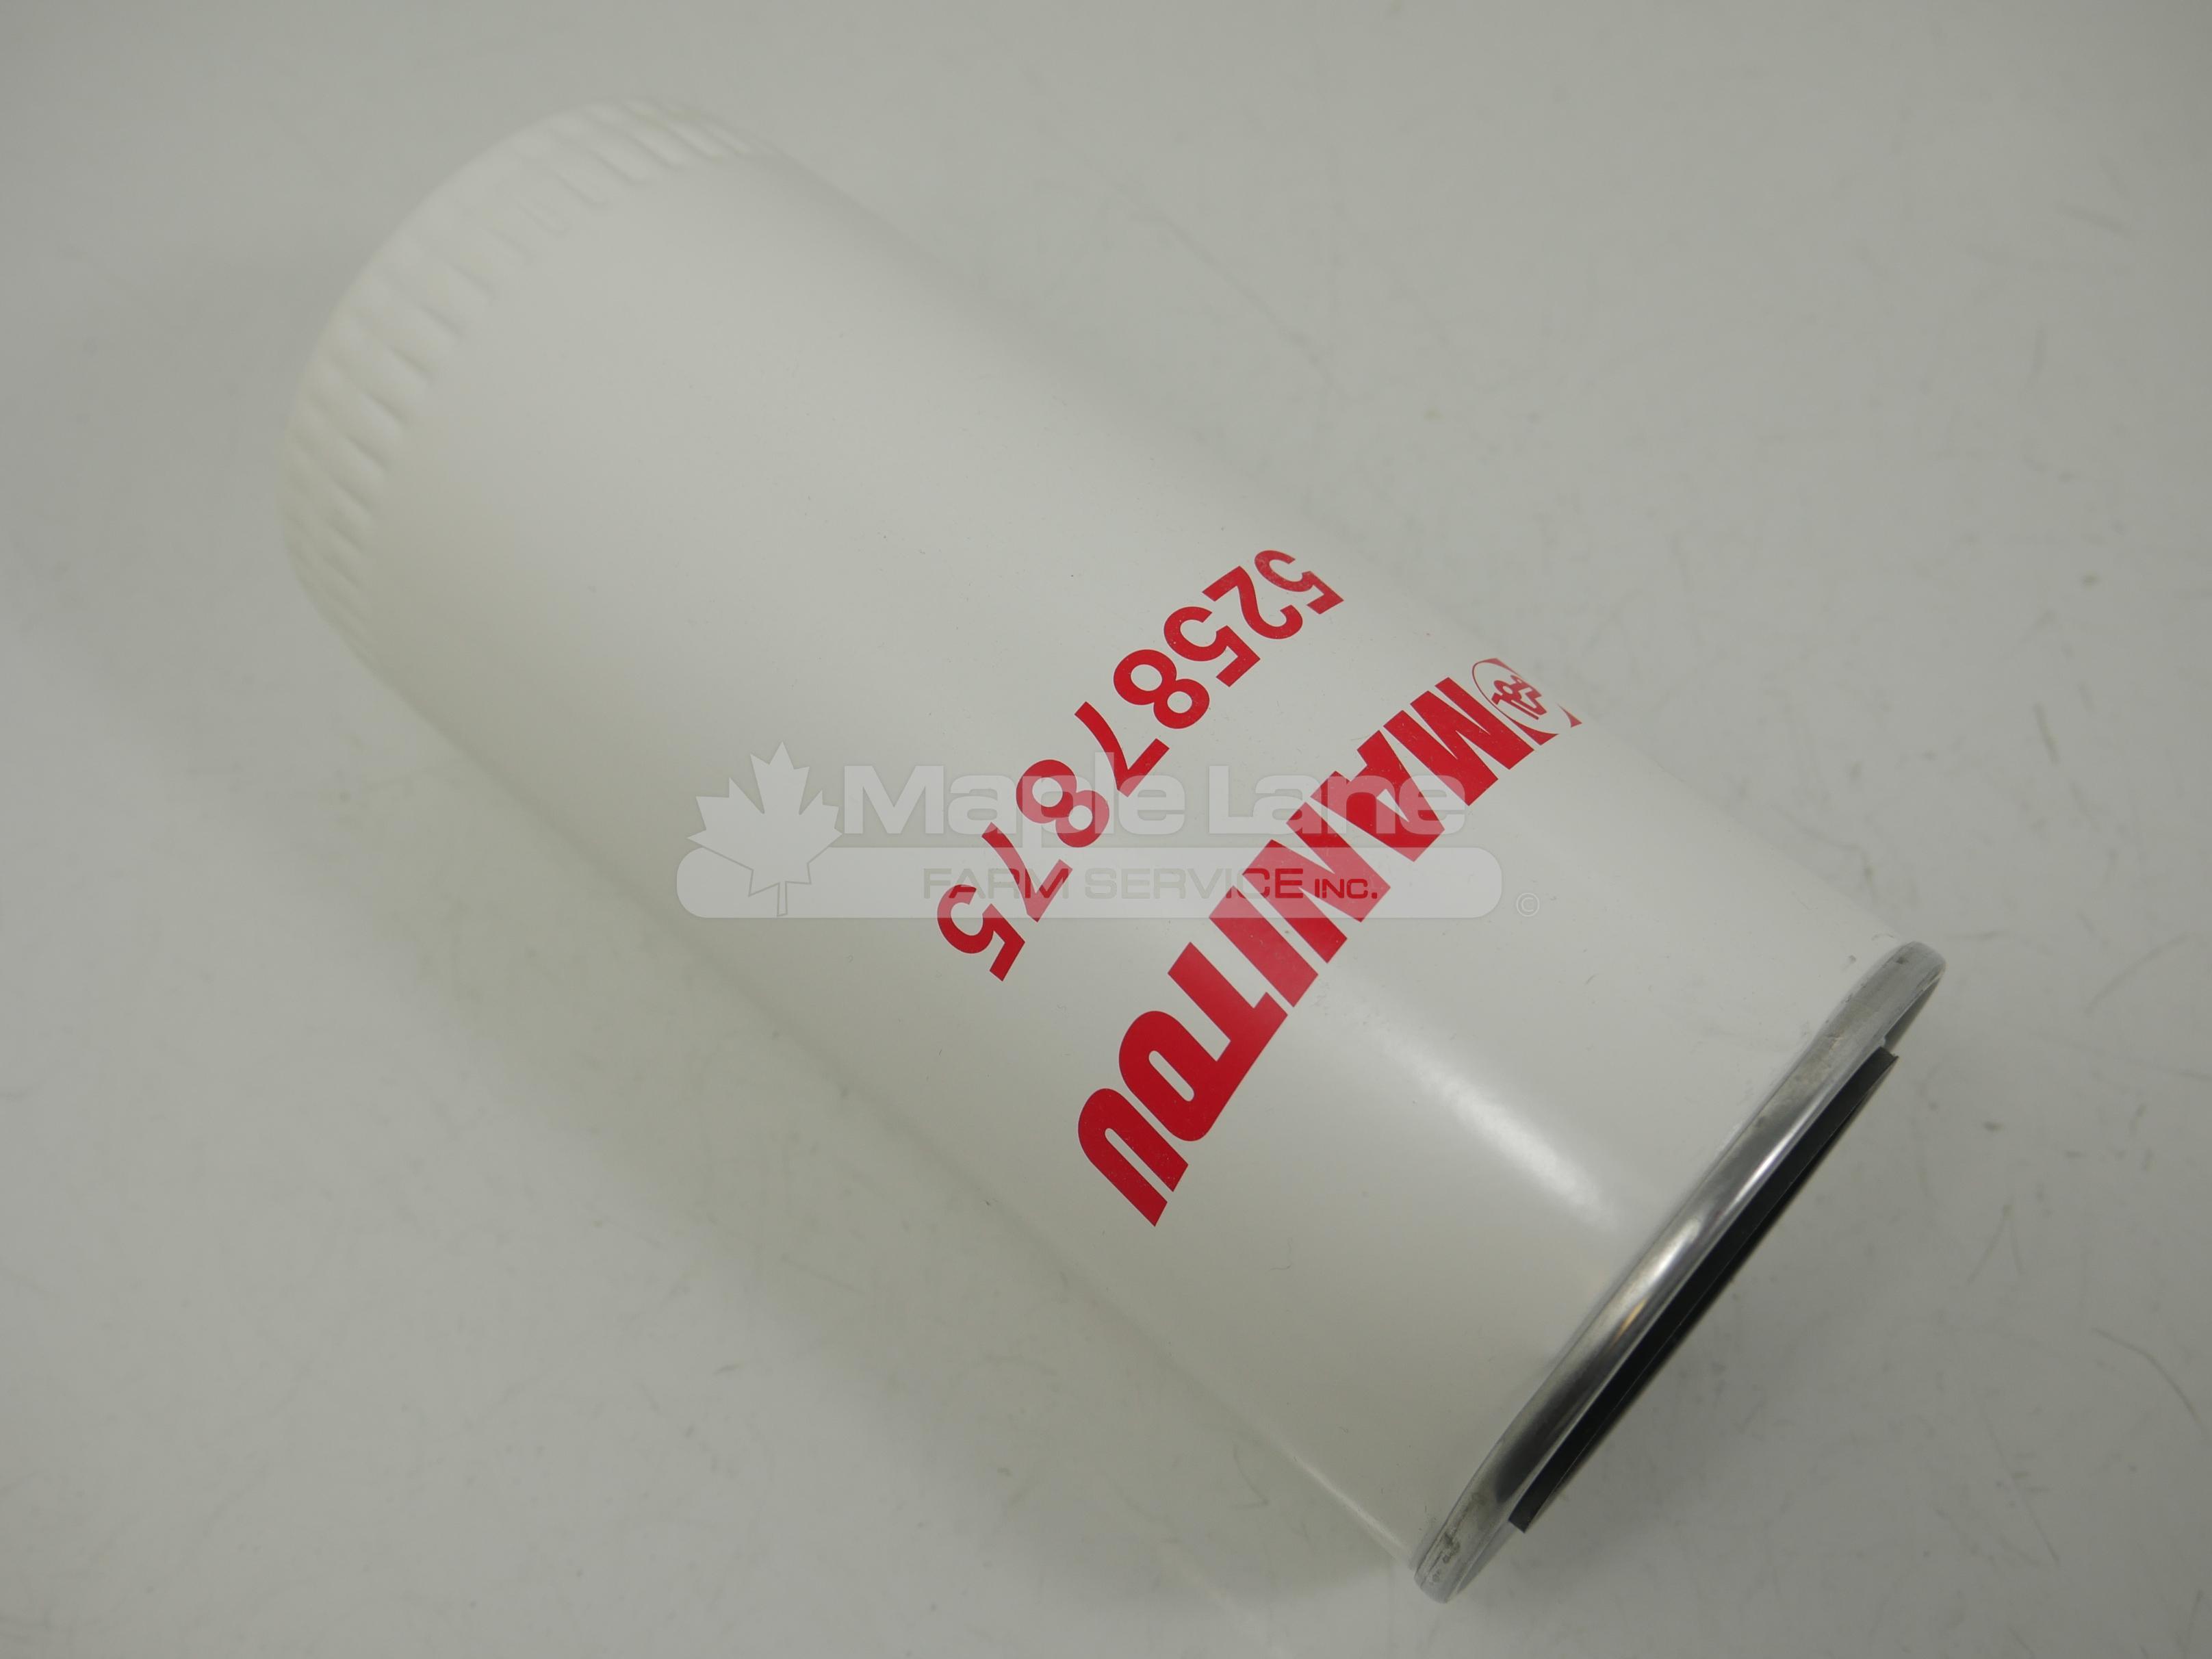 52587875 Hydraulic Oil Filter